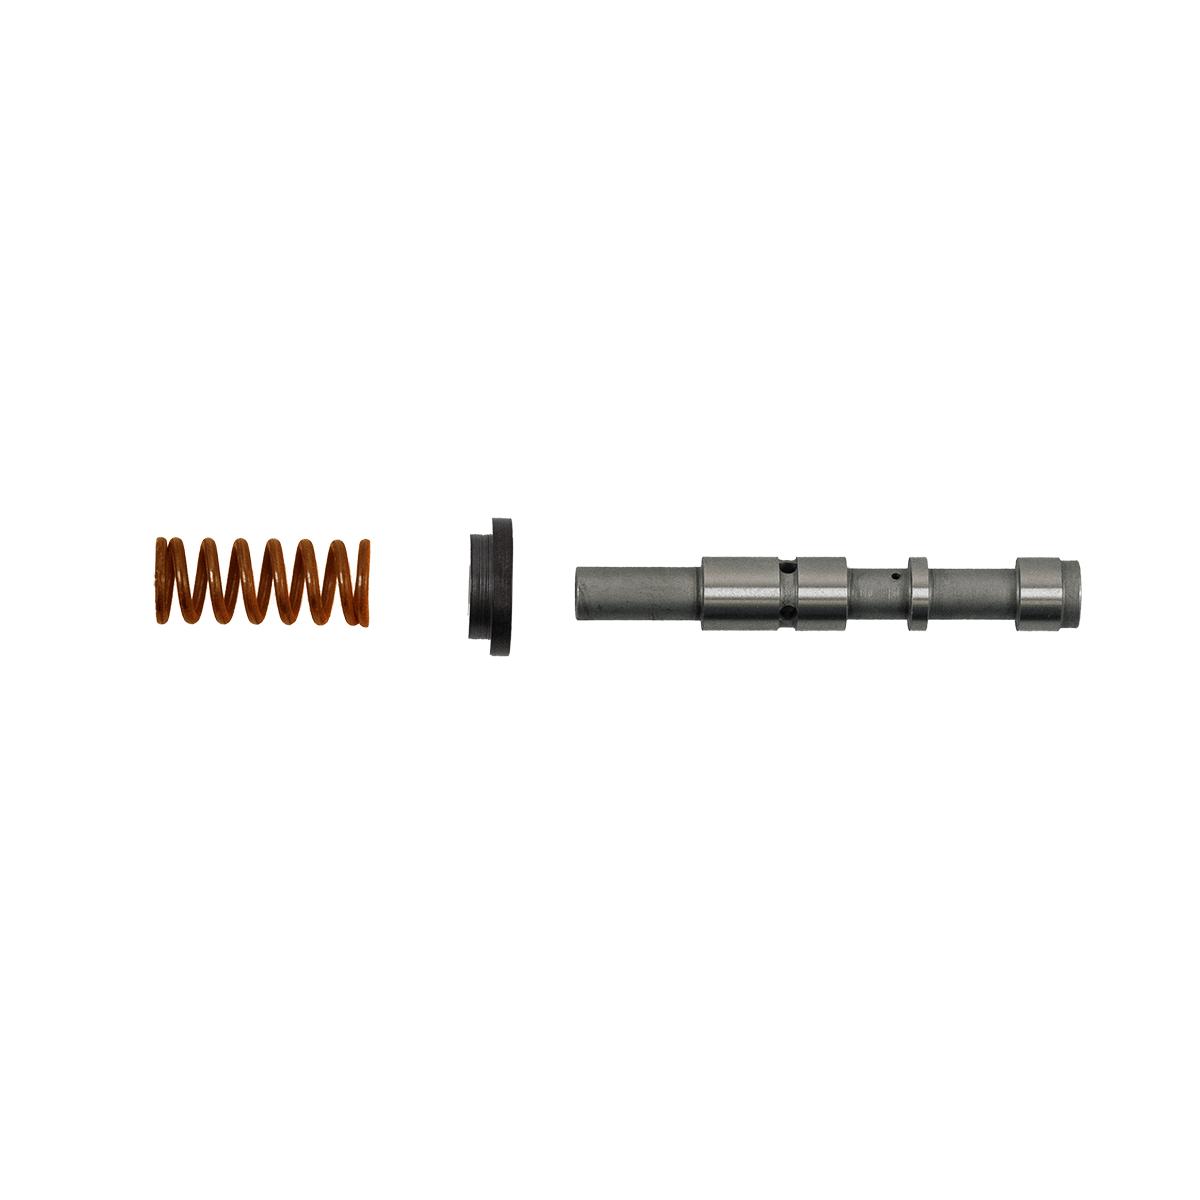 4l60e pressure regulator valve